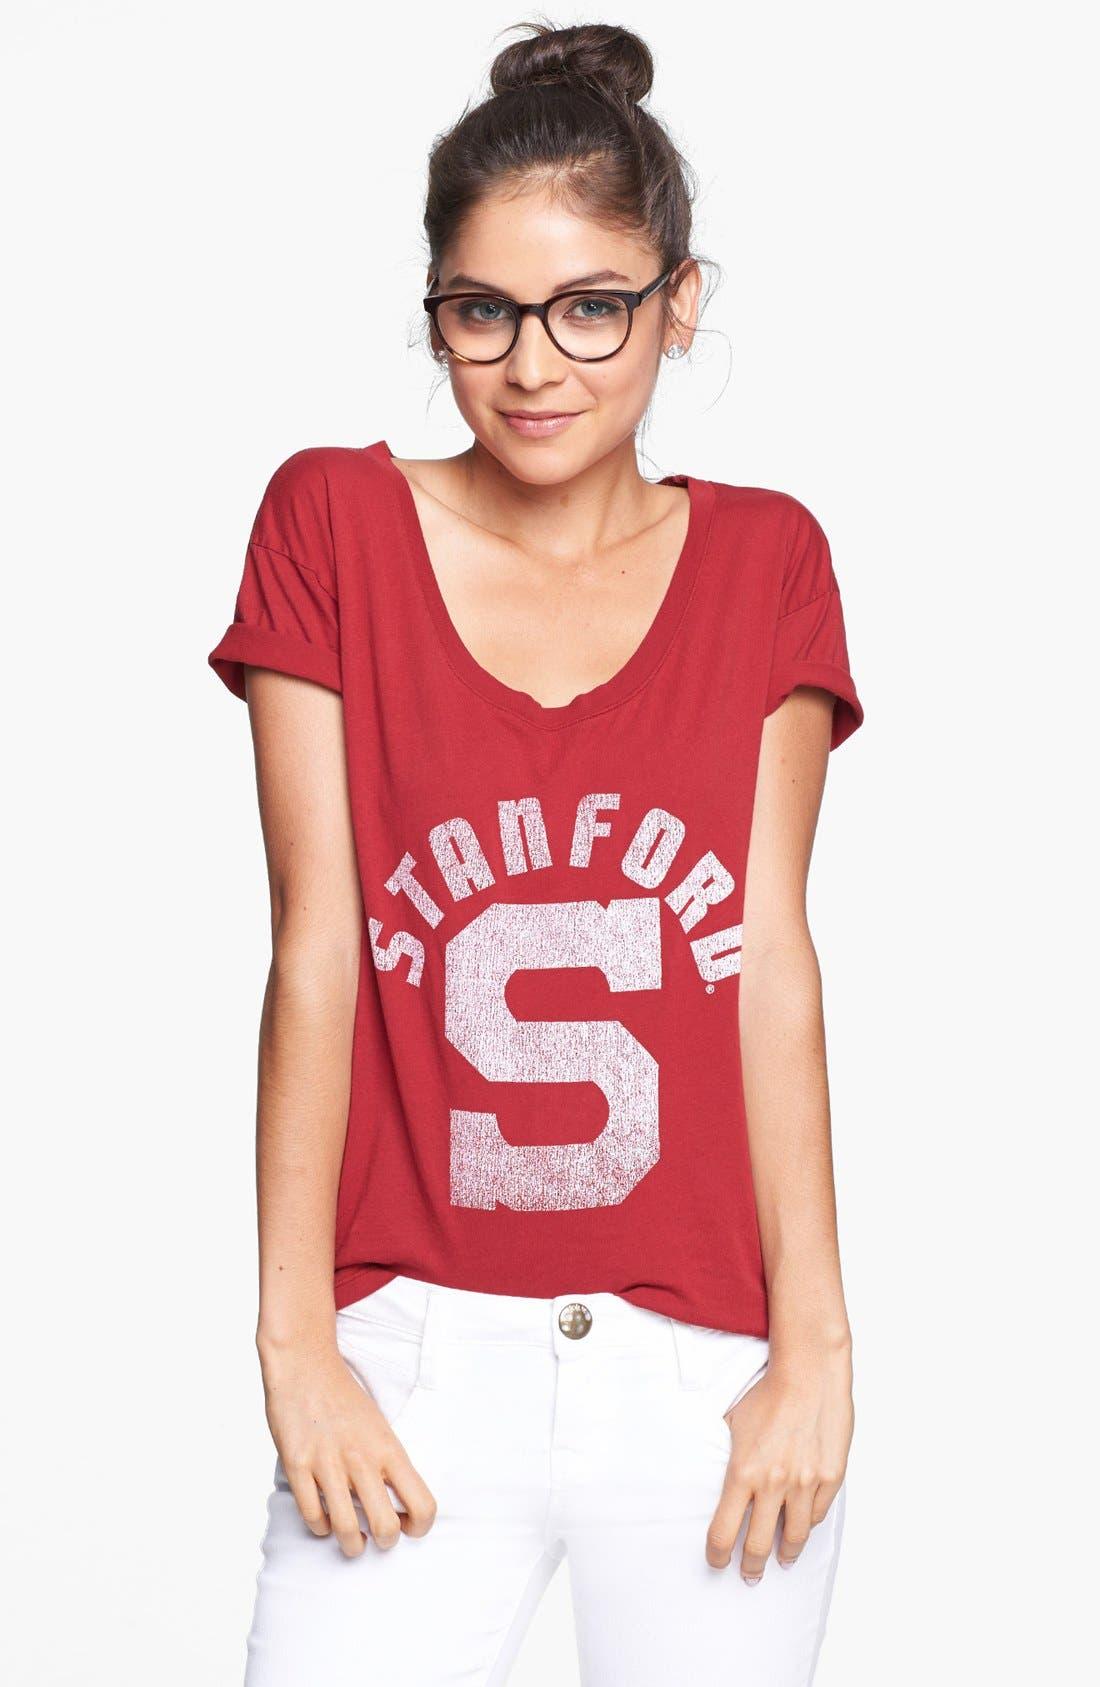 Alternate Image 1 Selected - Retro Brand 'Stanford University Cardinals' Graphic Tee (Juniors)